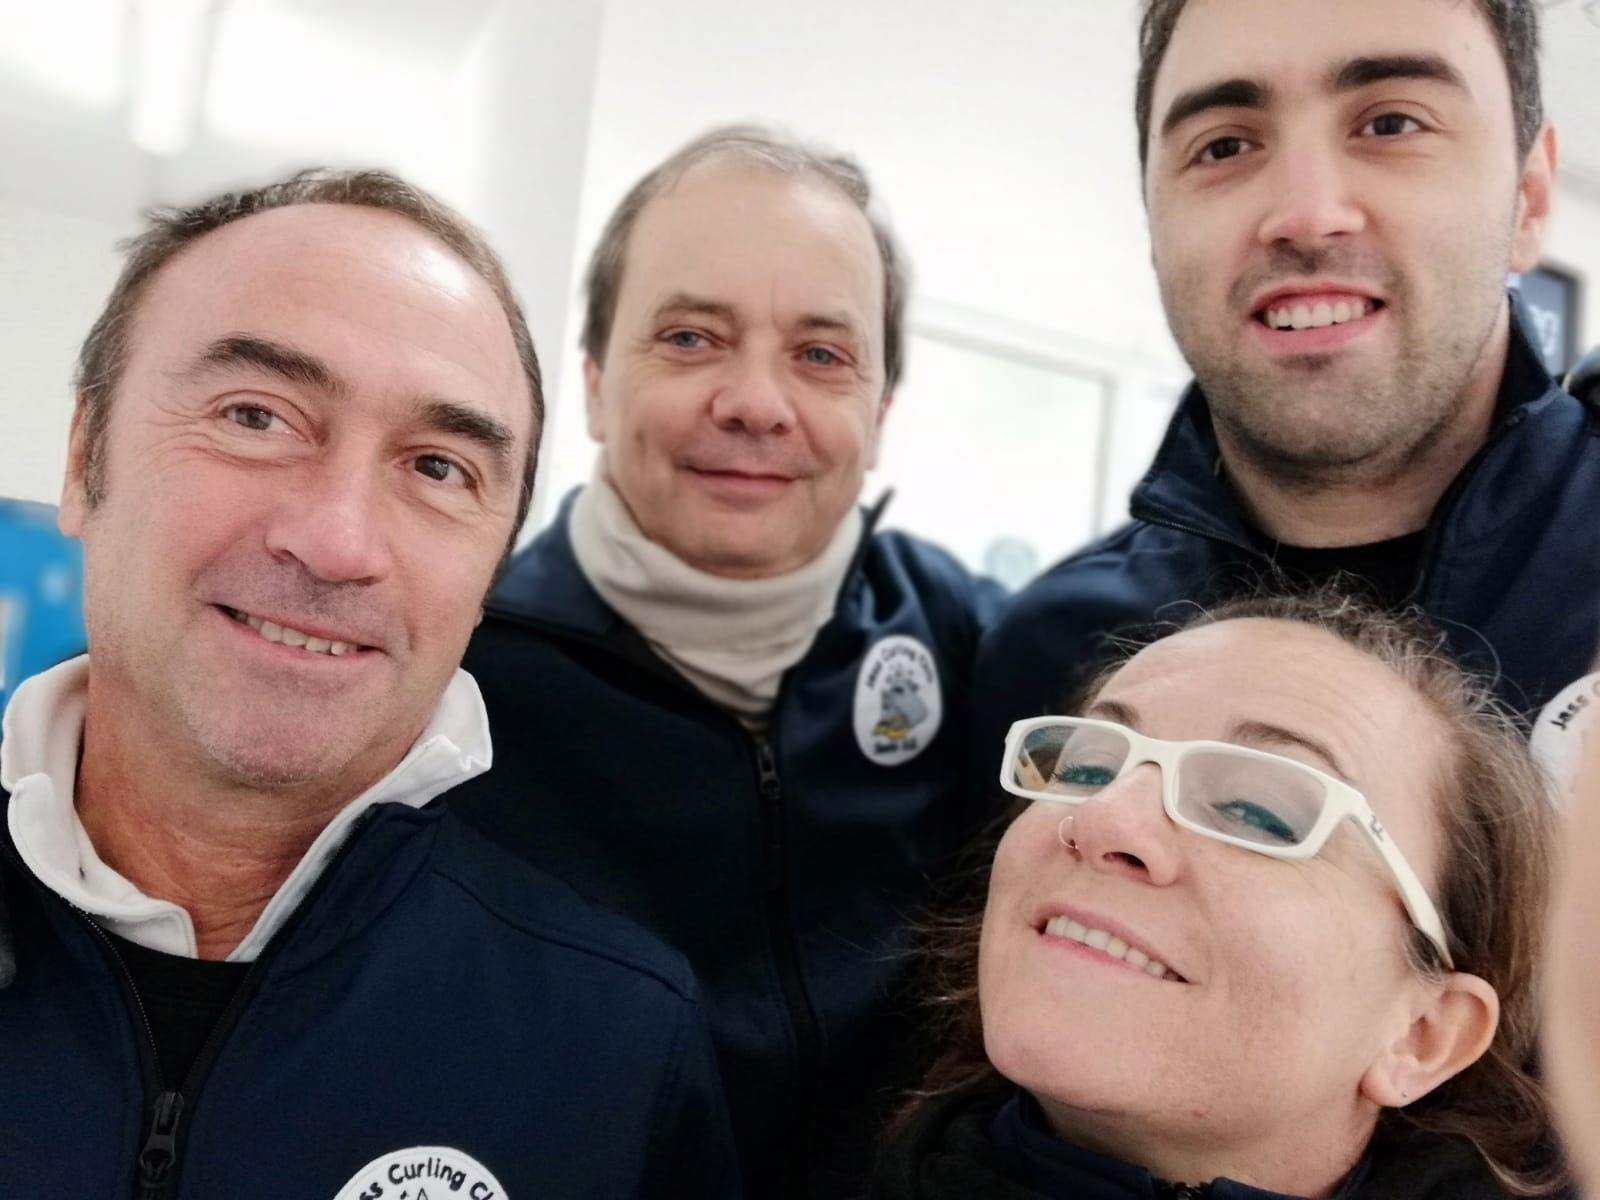 Campionato Regionale Lombardo 2018/2019 – 1° turno – Bormio